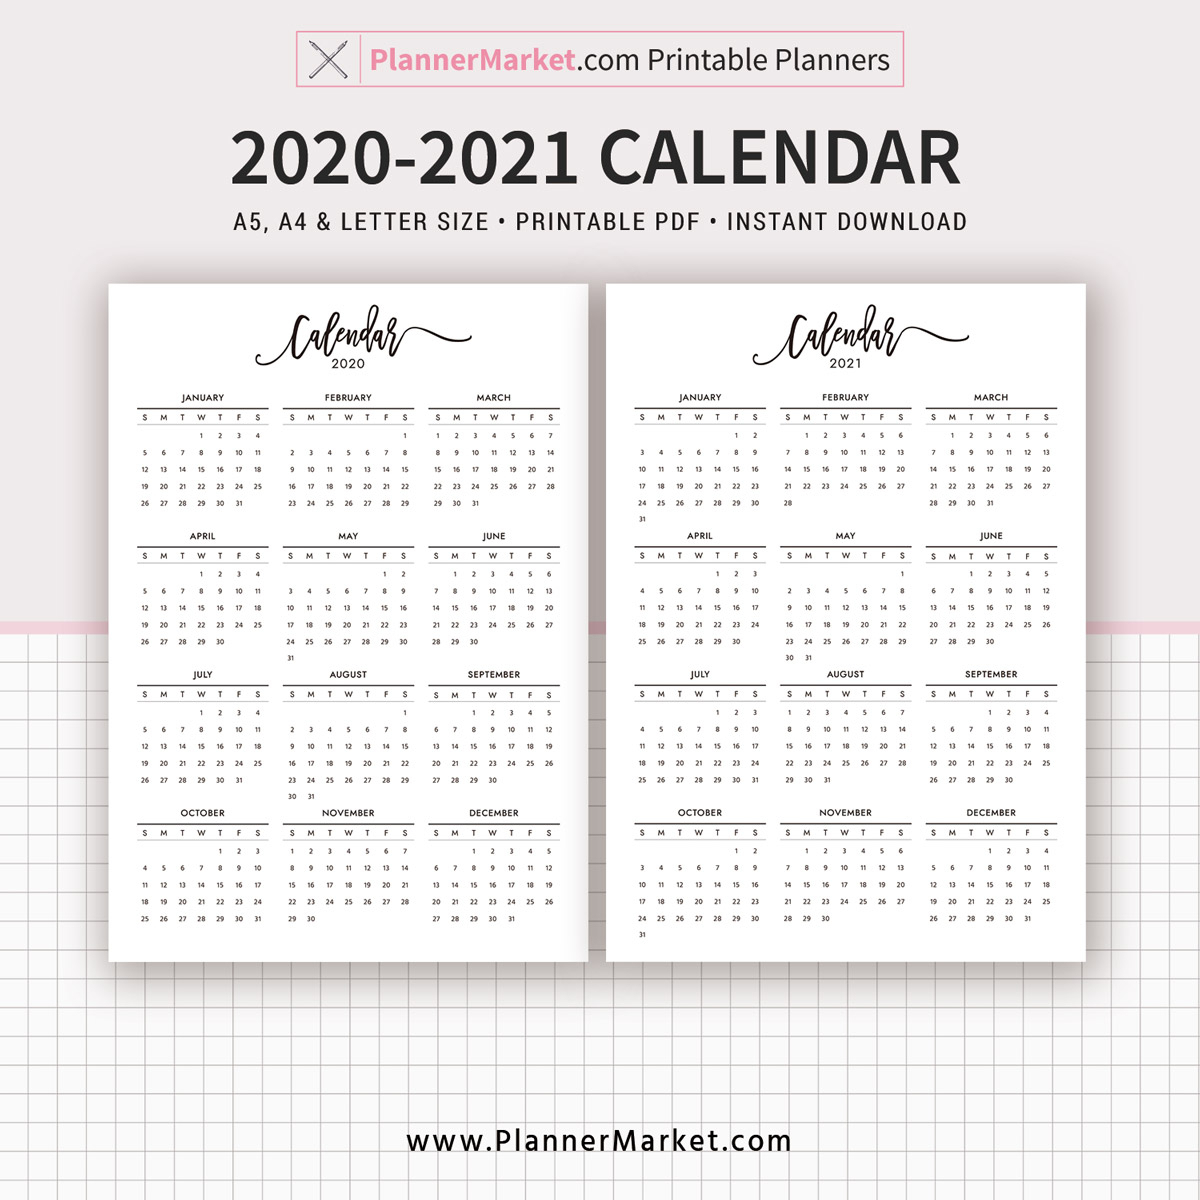 Take Calendar 2020 - 2021 Template | Calendar Printables inside 2021 Calendar Printable Large Squares